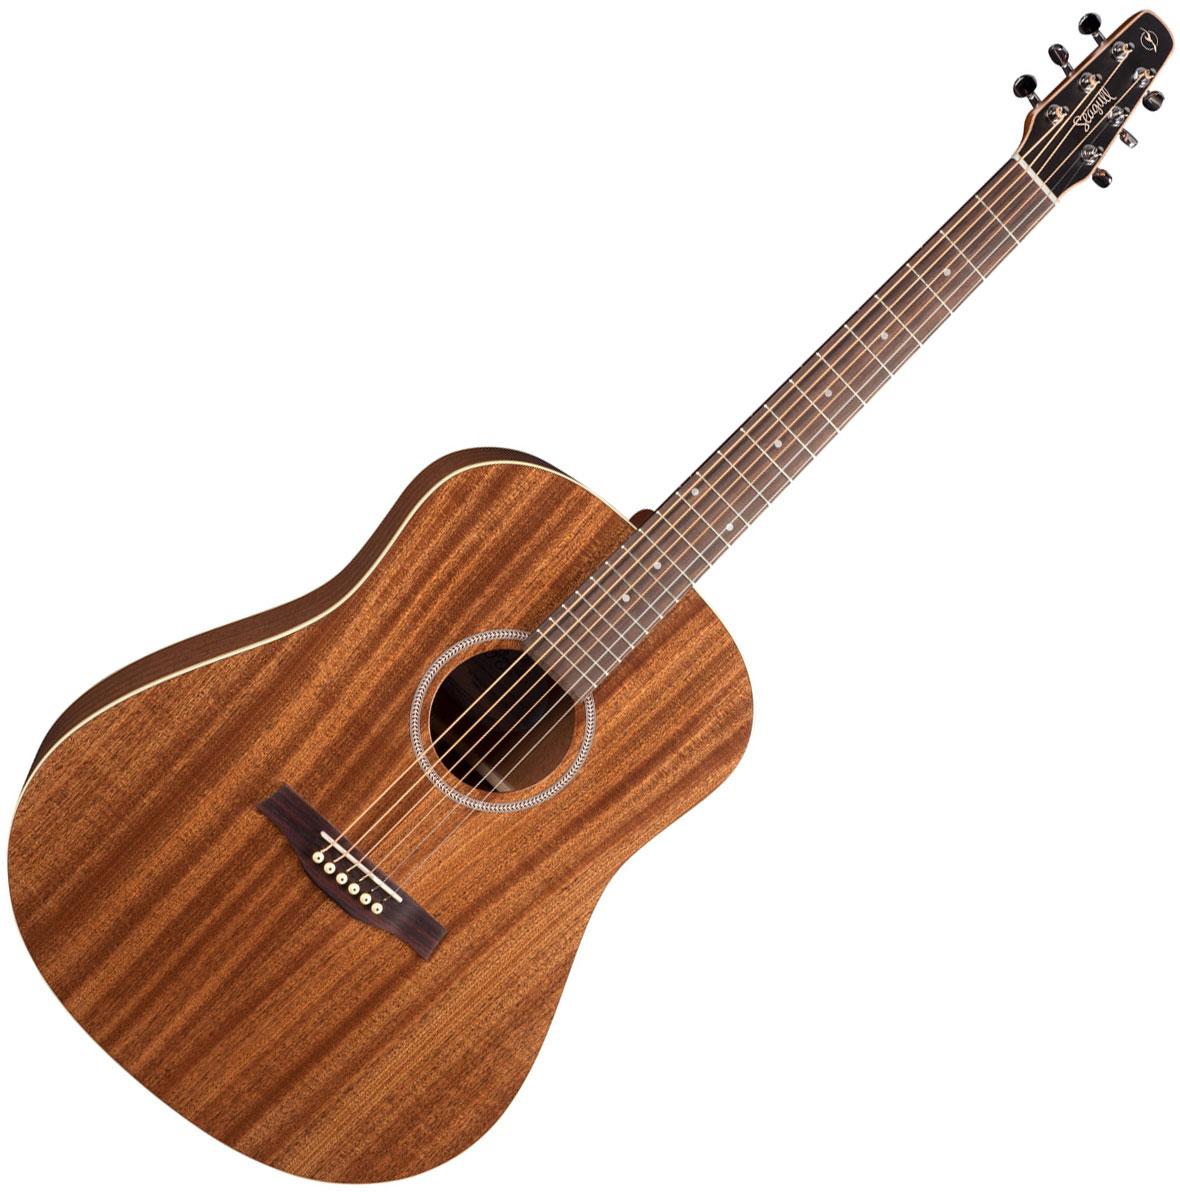 guitare folk seagull s6 mahogany deluxe a e natural star 39 s music. Black Bedroom Furniture Sets. Home Design Ideas